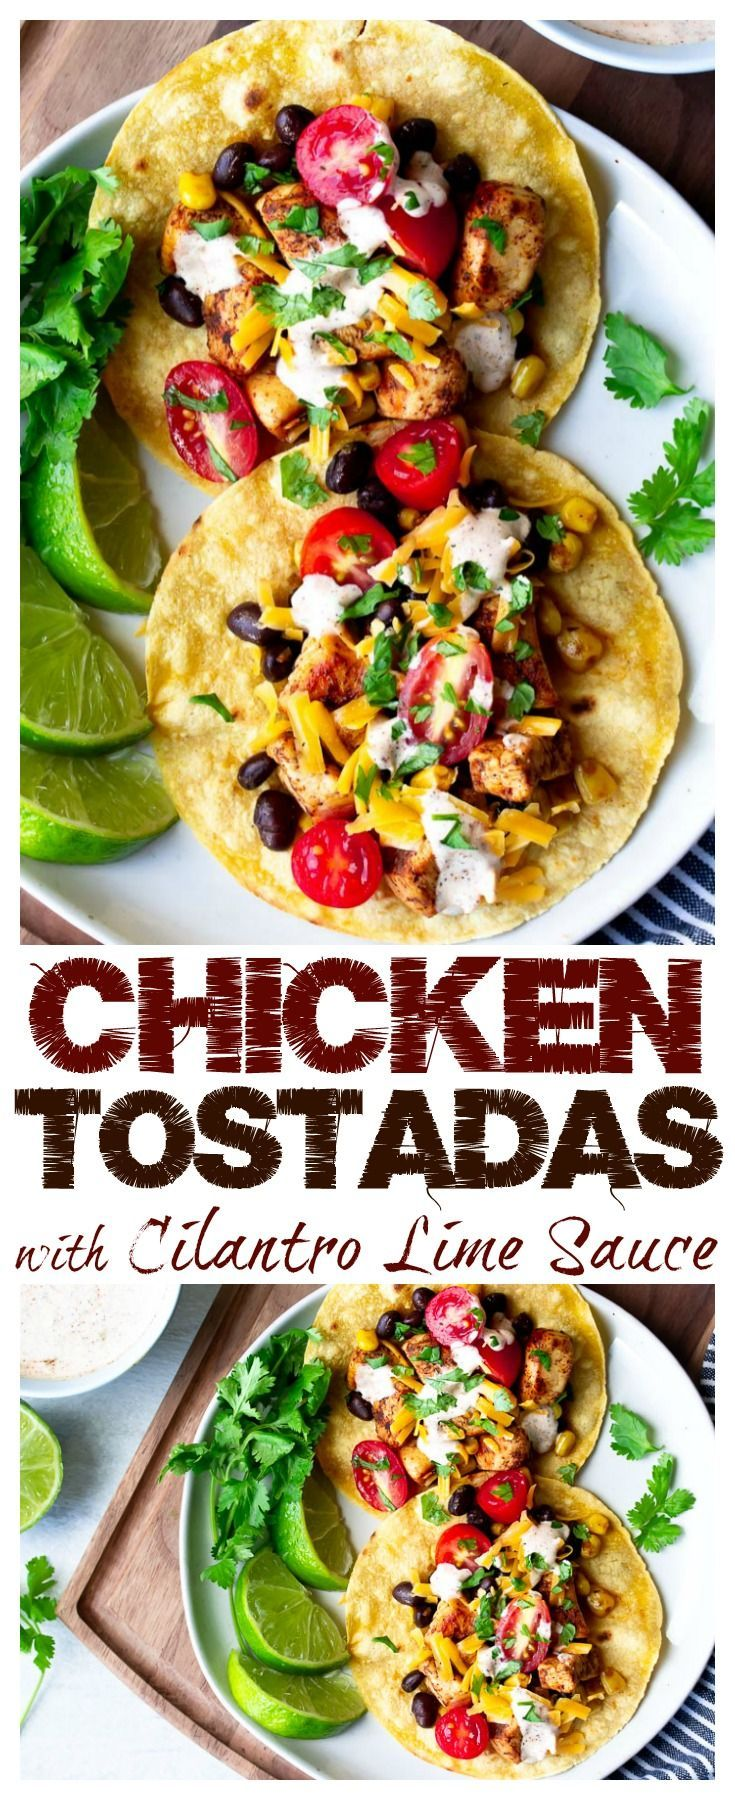 Photo of Easy Chicken Tostadas Recipe with Creamy Cilantro Lime Sauce